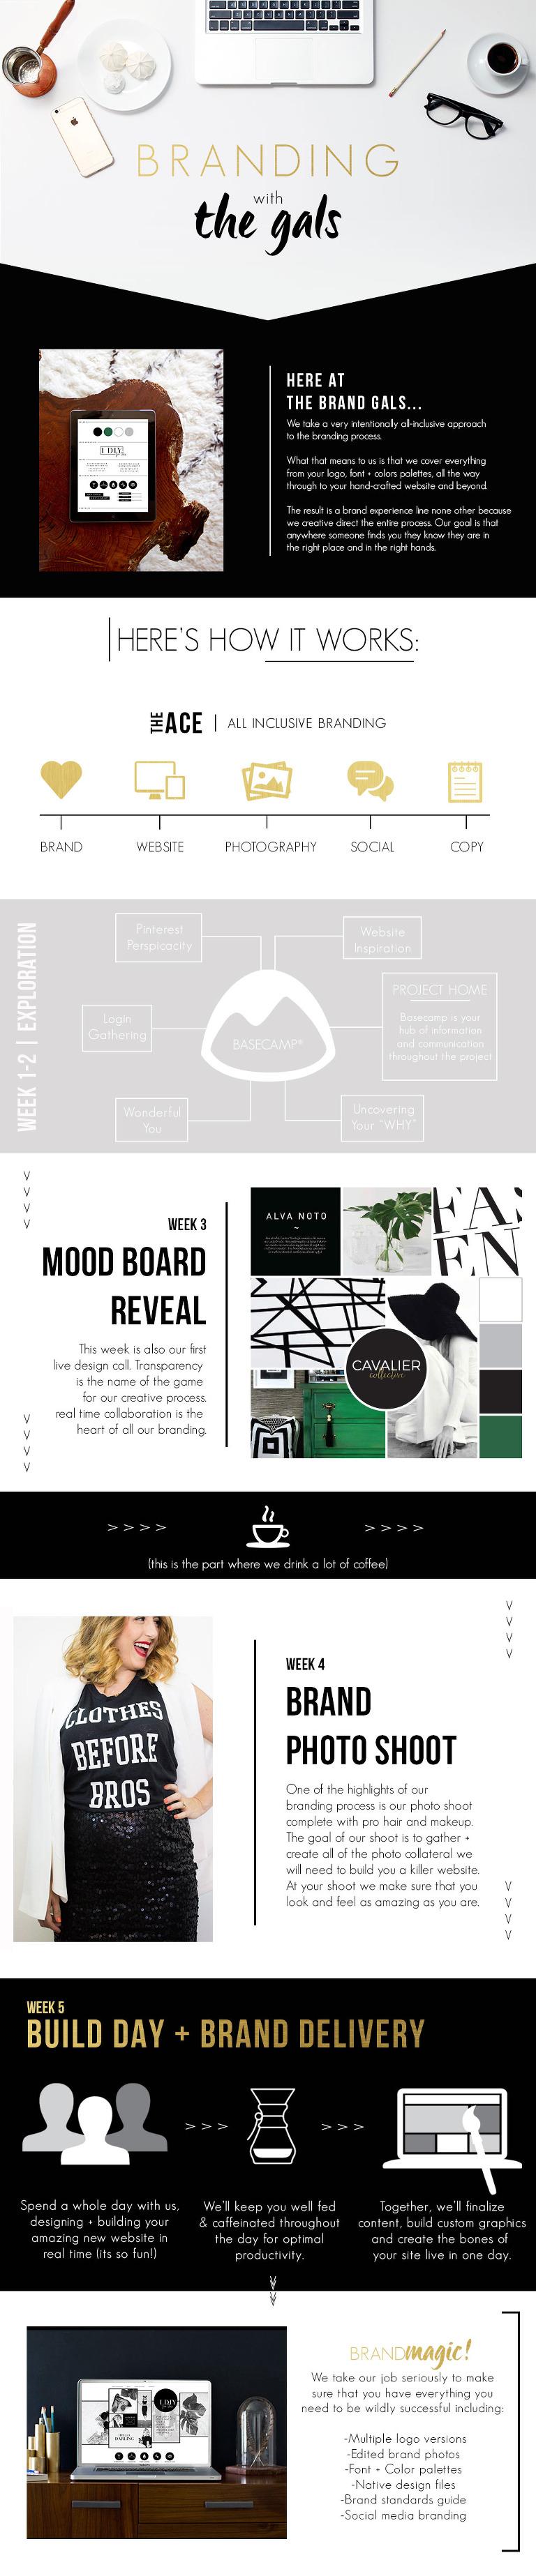 TBG-Branding-Process